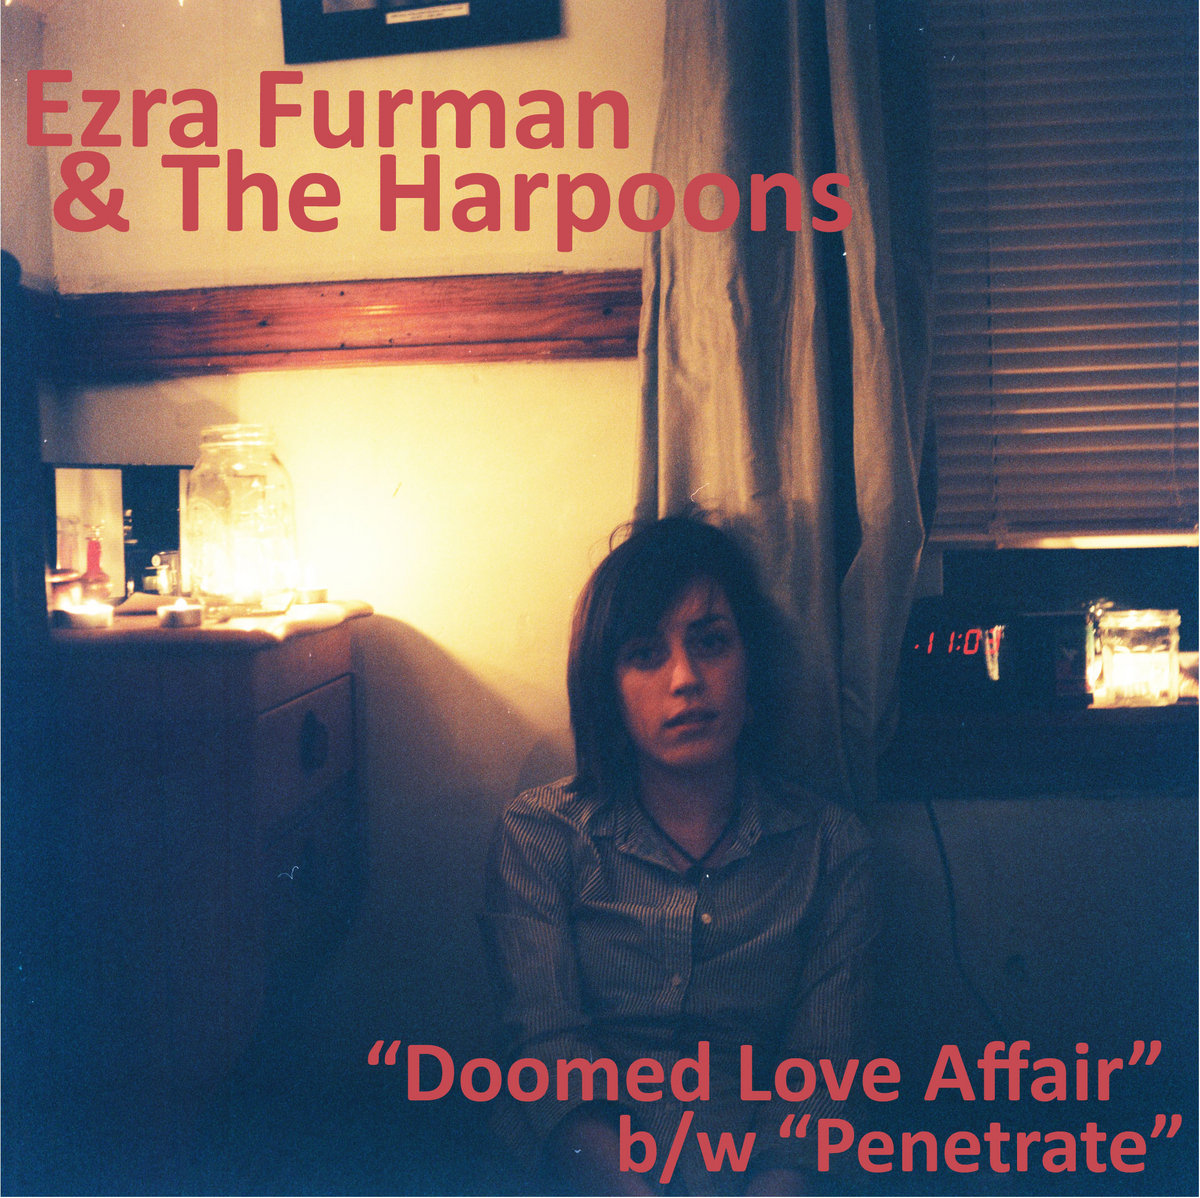 Ezra furman torrent day of the dog